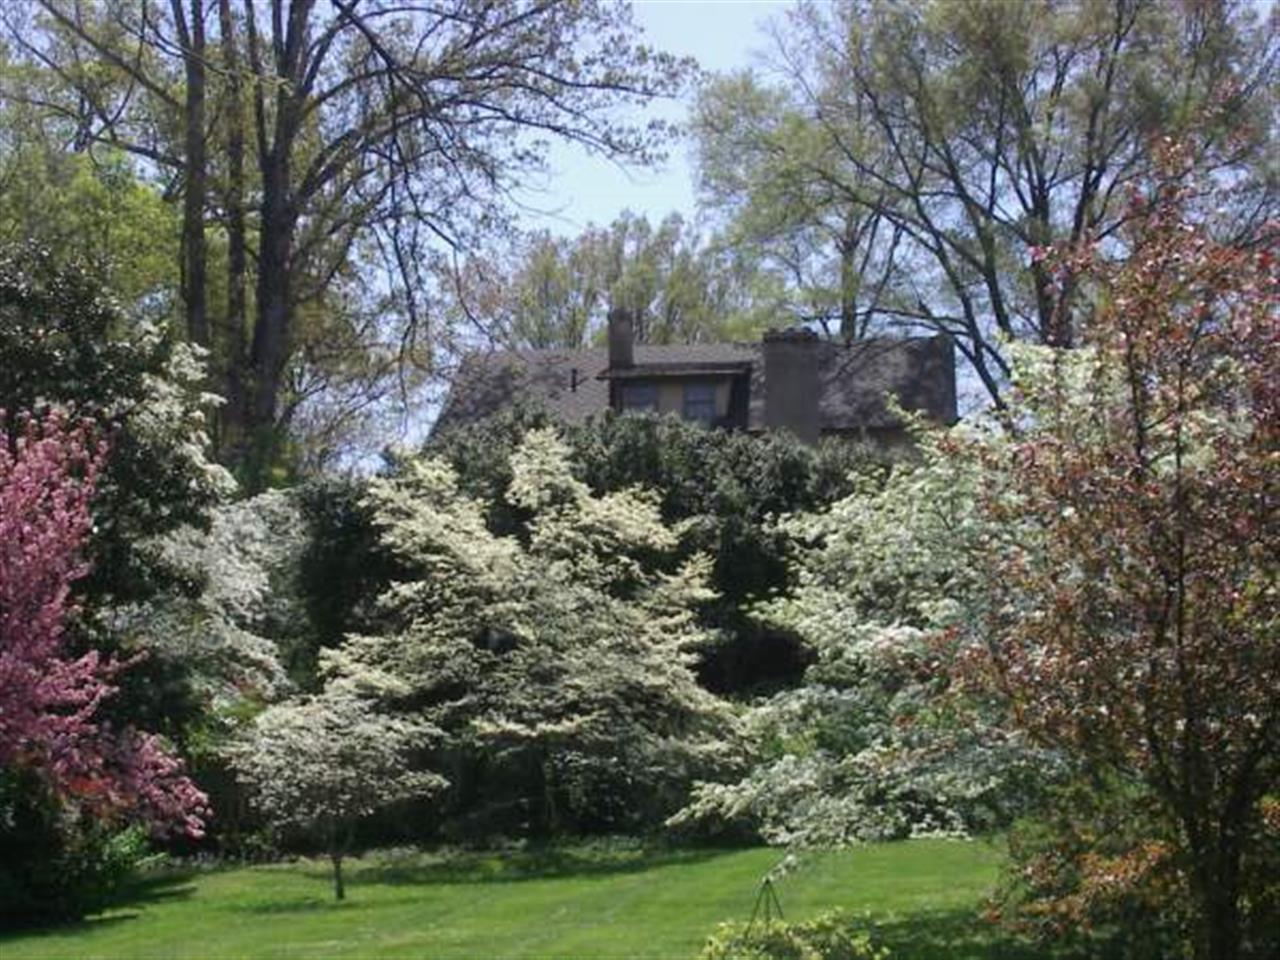 Spring in Washington Park, Winston-Salem, NC